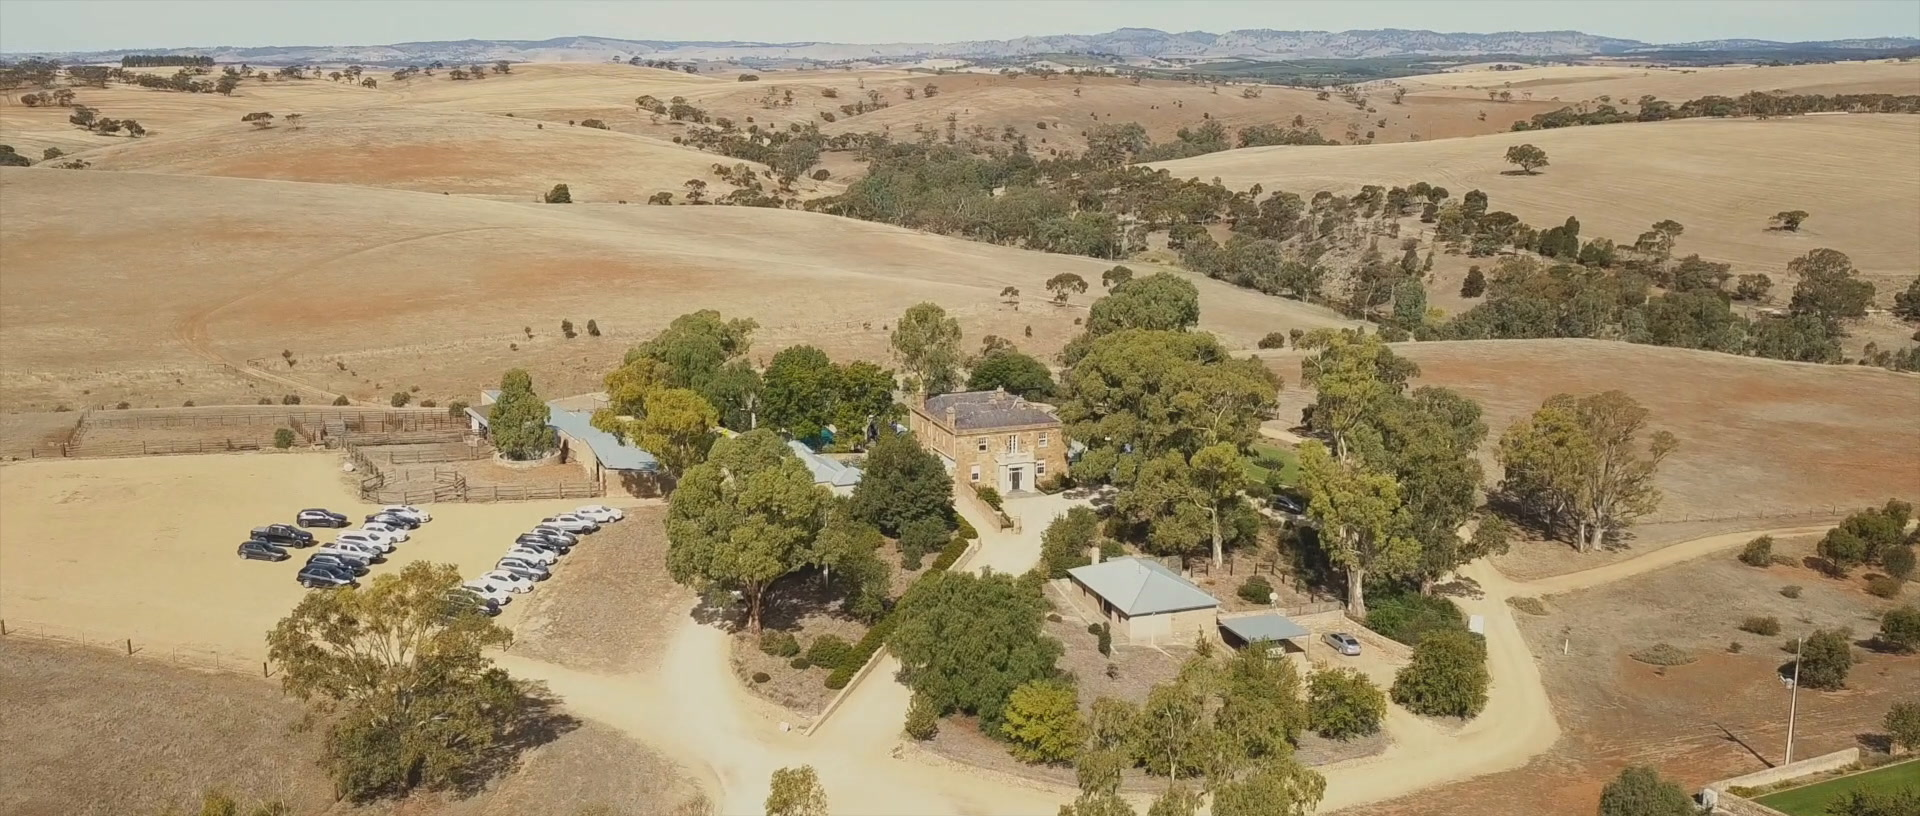 Shavaun + Scott | The Barossa Council, Australia | Kingsford Homestead